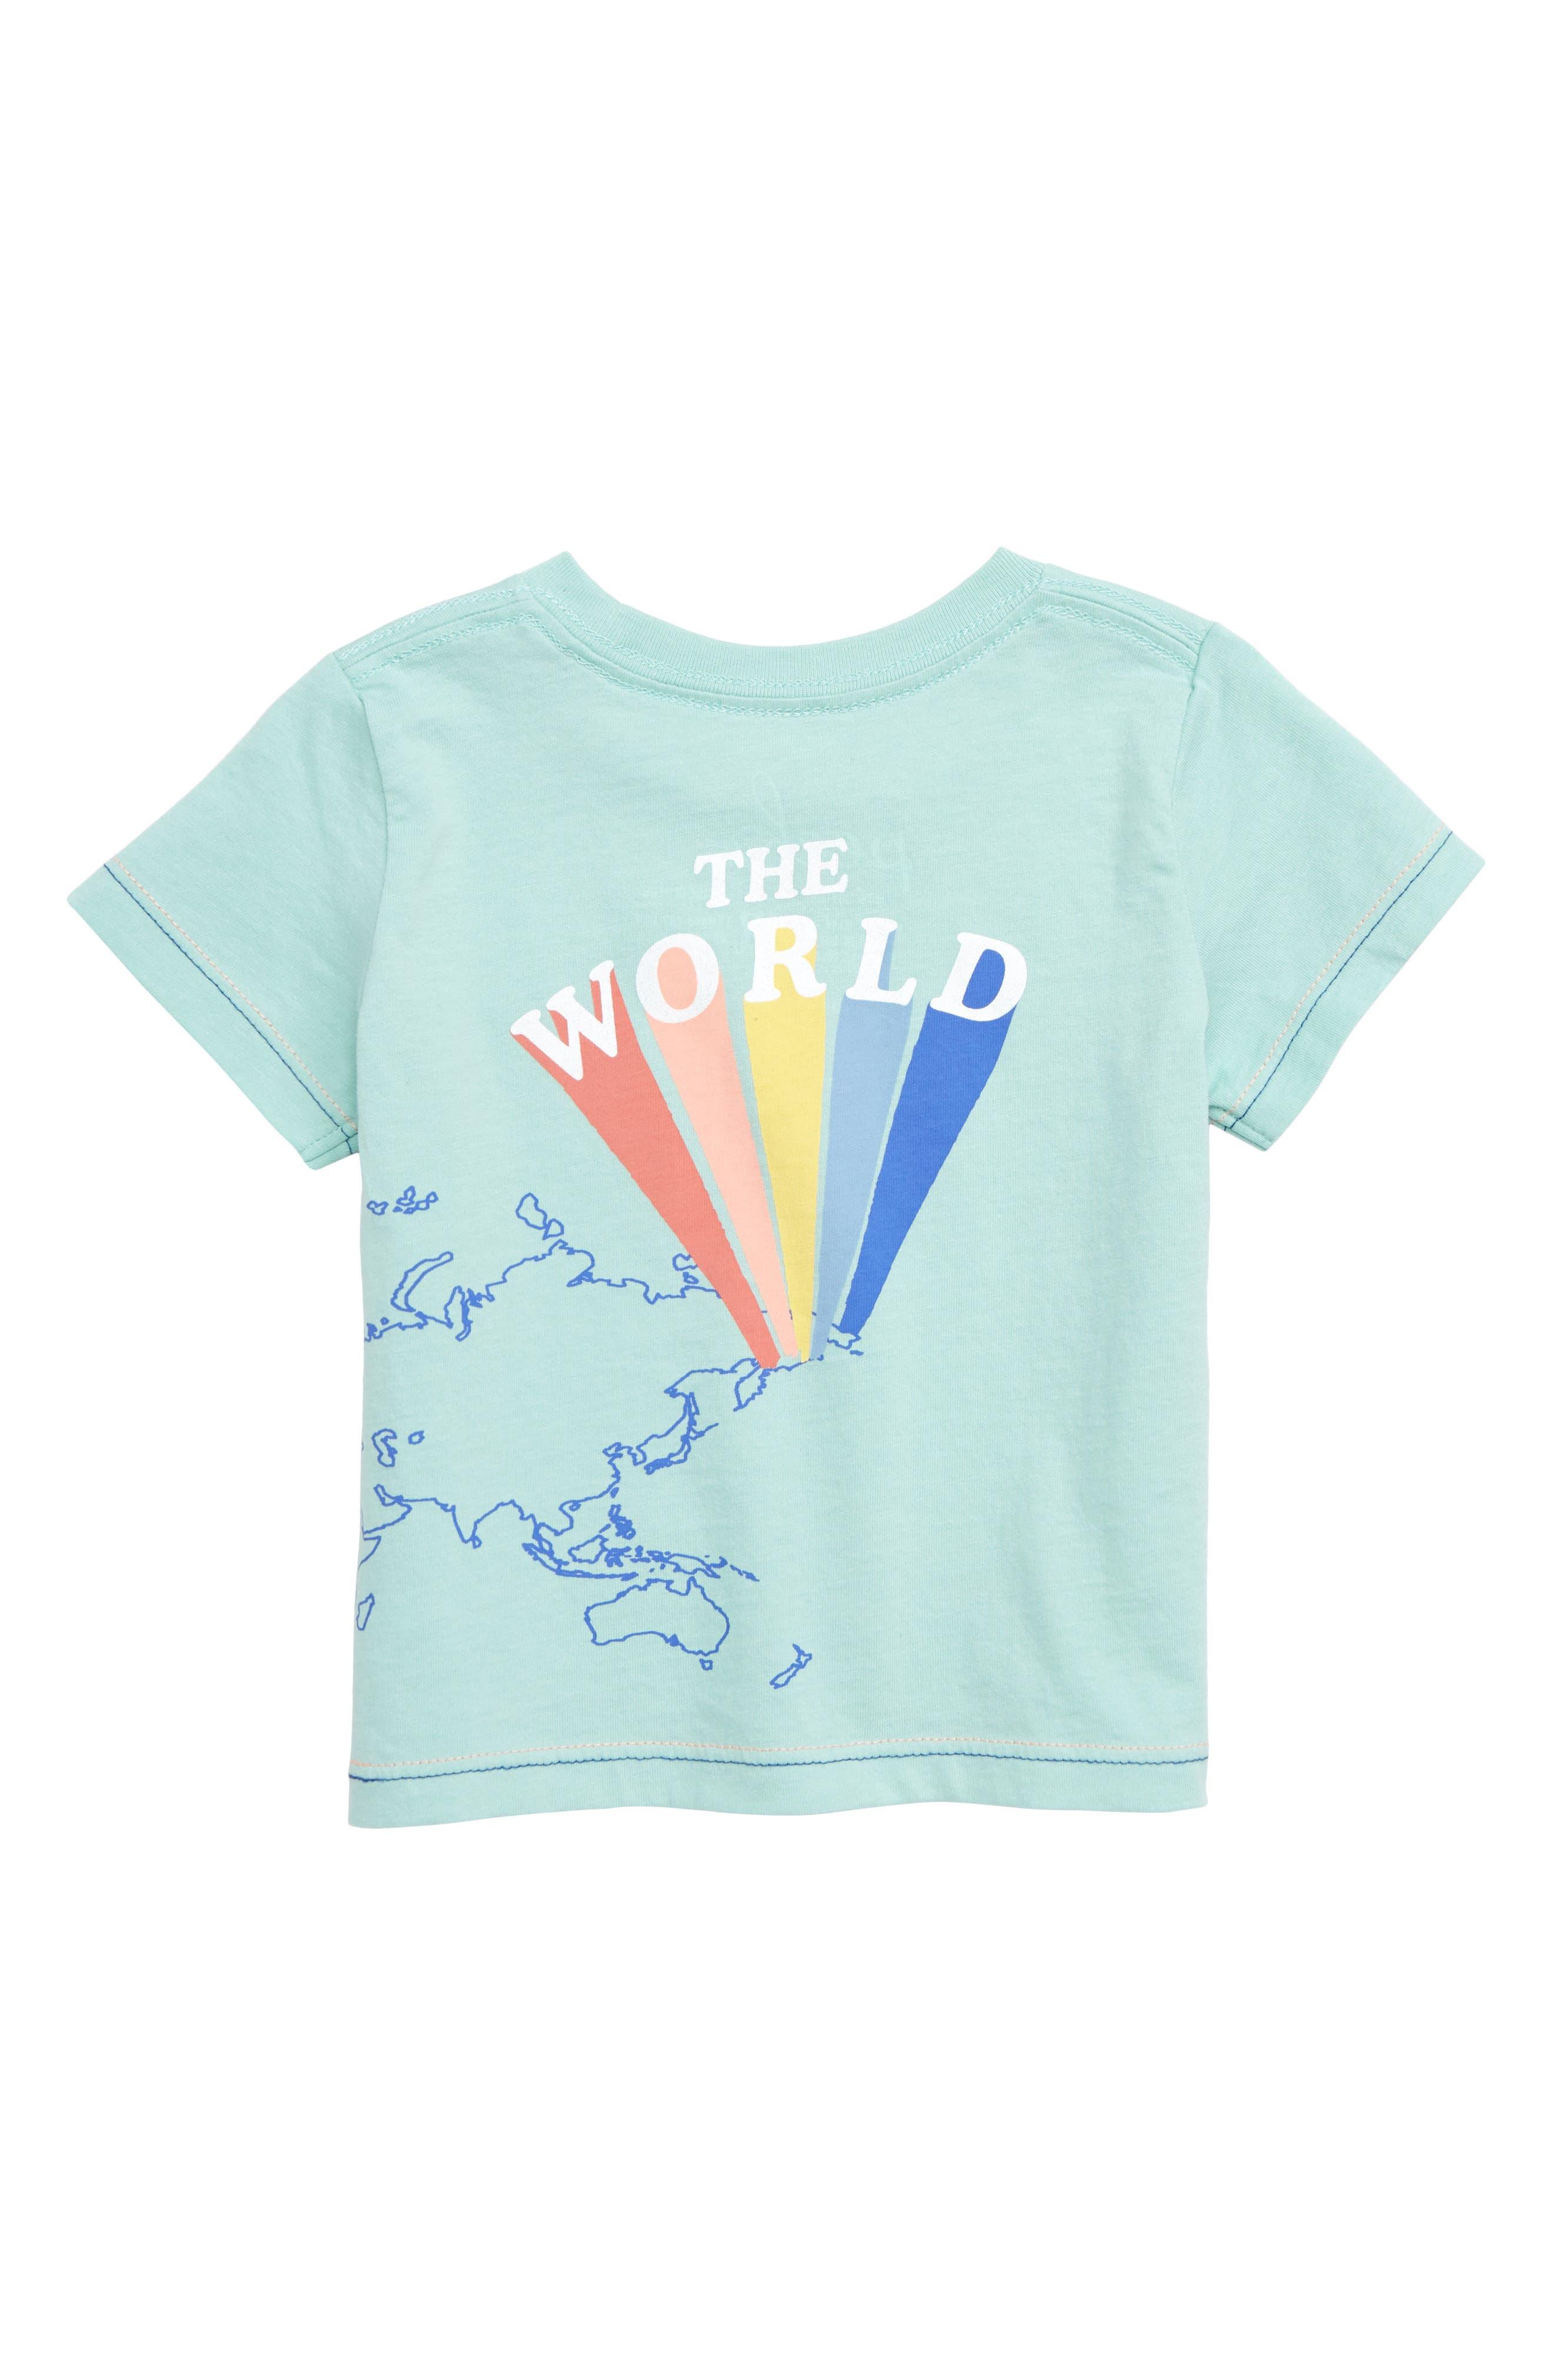 PEEK ESSENTIALS,                             Peek Change the World Graphic T-Shirt,                             Alternate thumbnail 2, color,                             BLUE